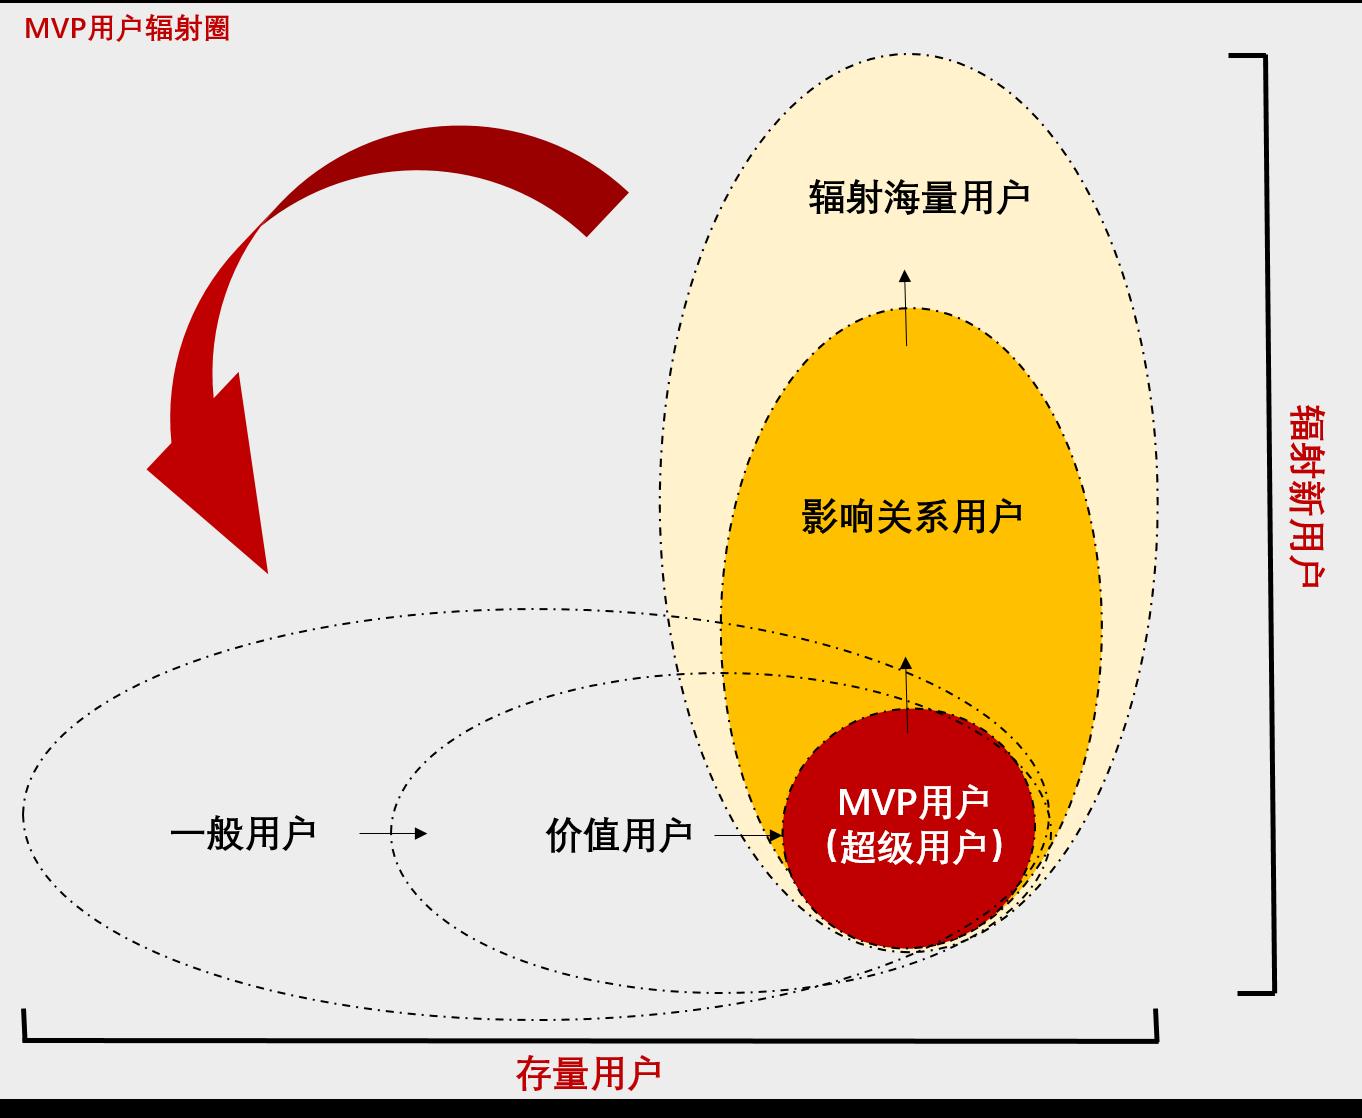 MVP用户辐射圈:打造ToB企业的用户运营模型